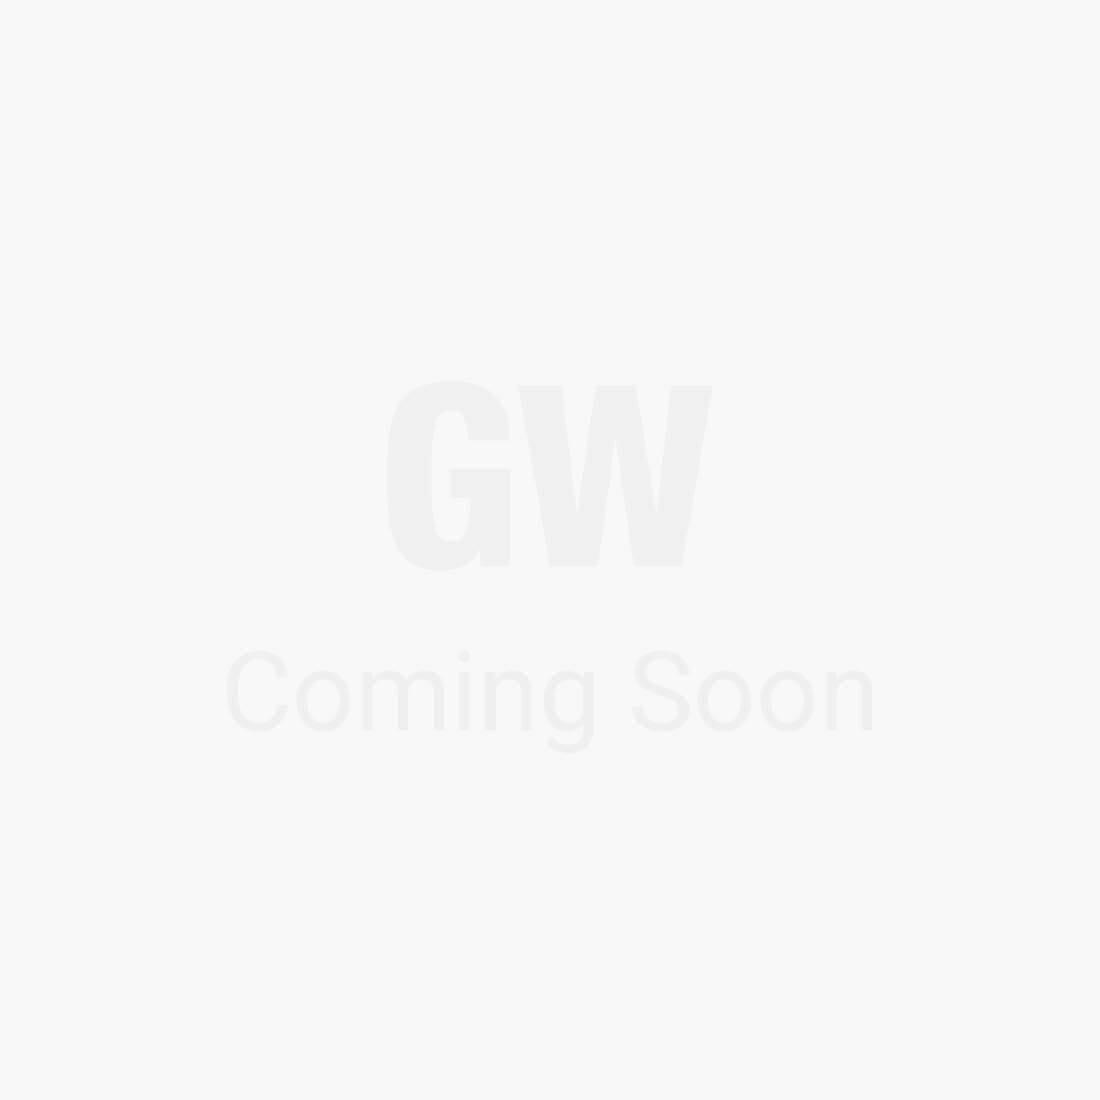 Vittoria Slip Cover Bedheads